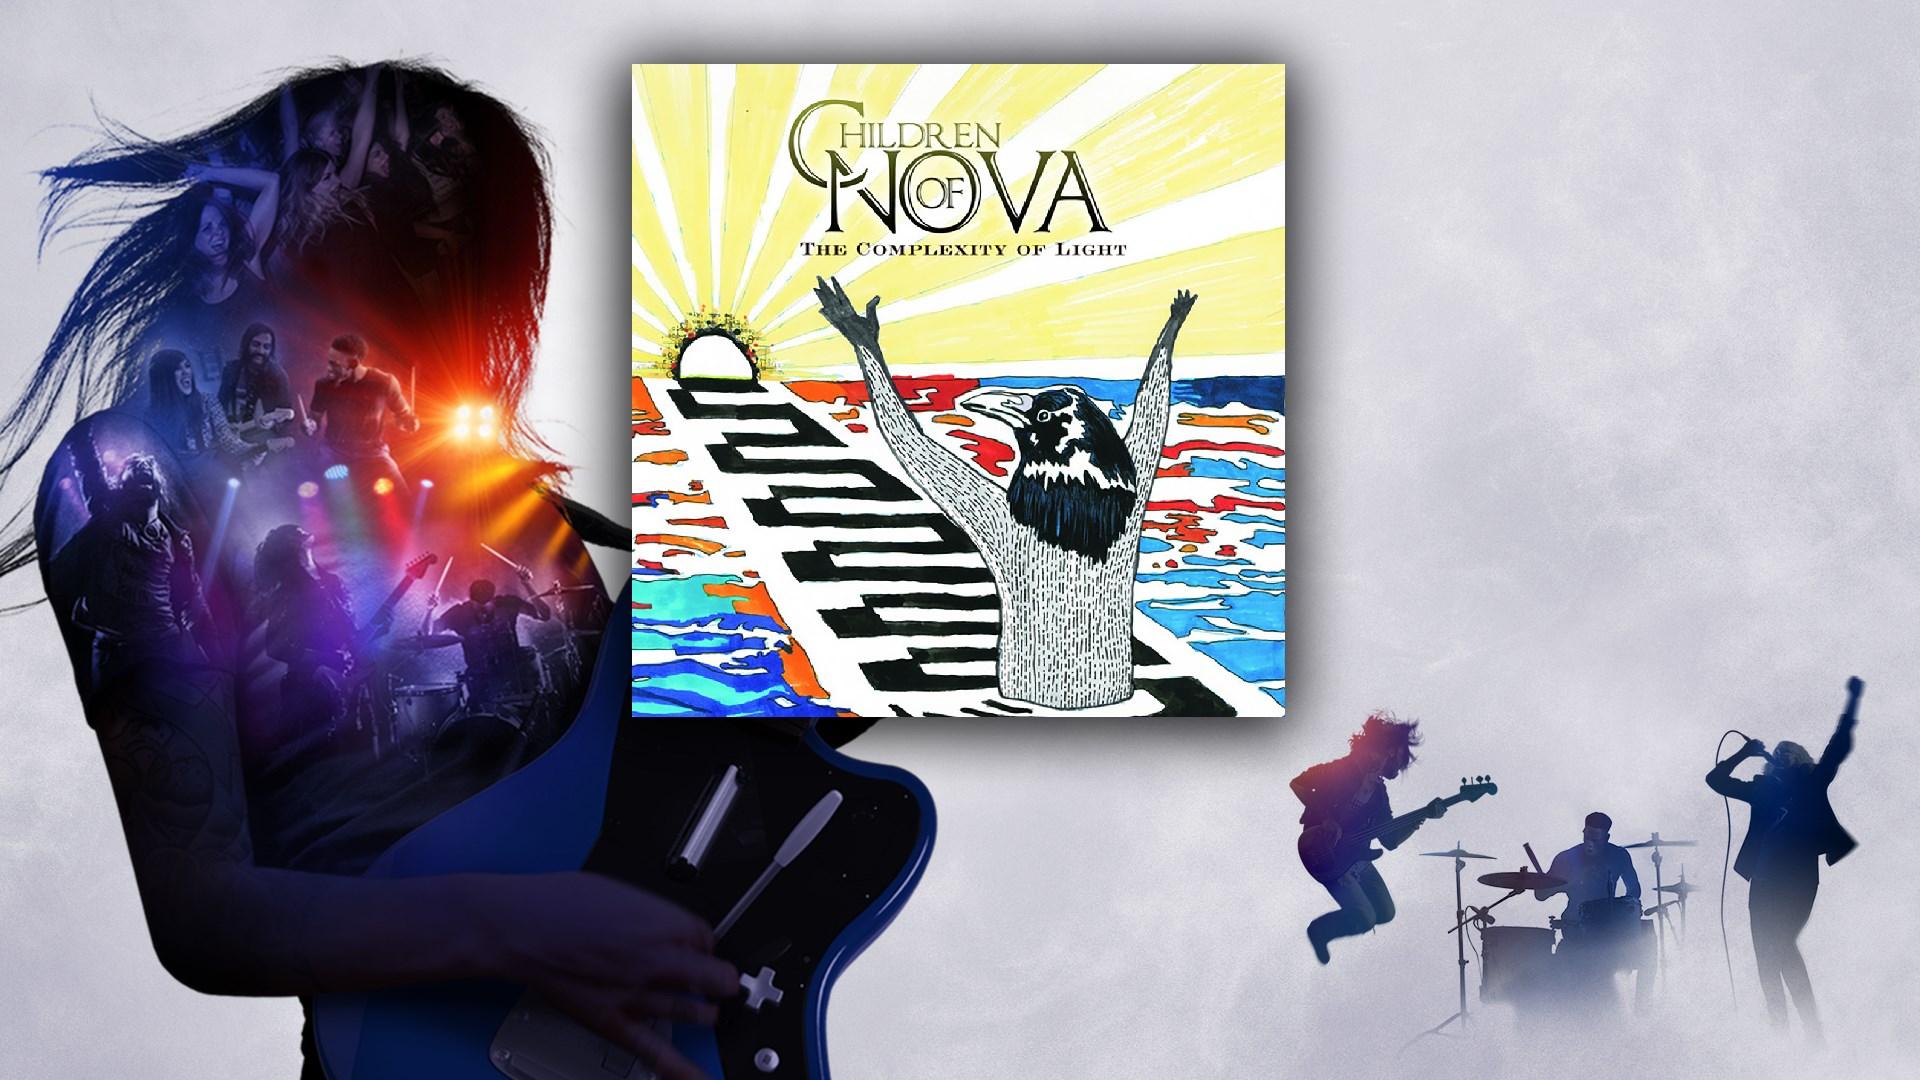 """The Complexity Of Light"" - Children of Nova"